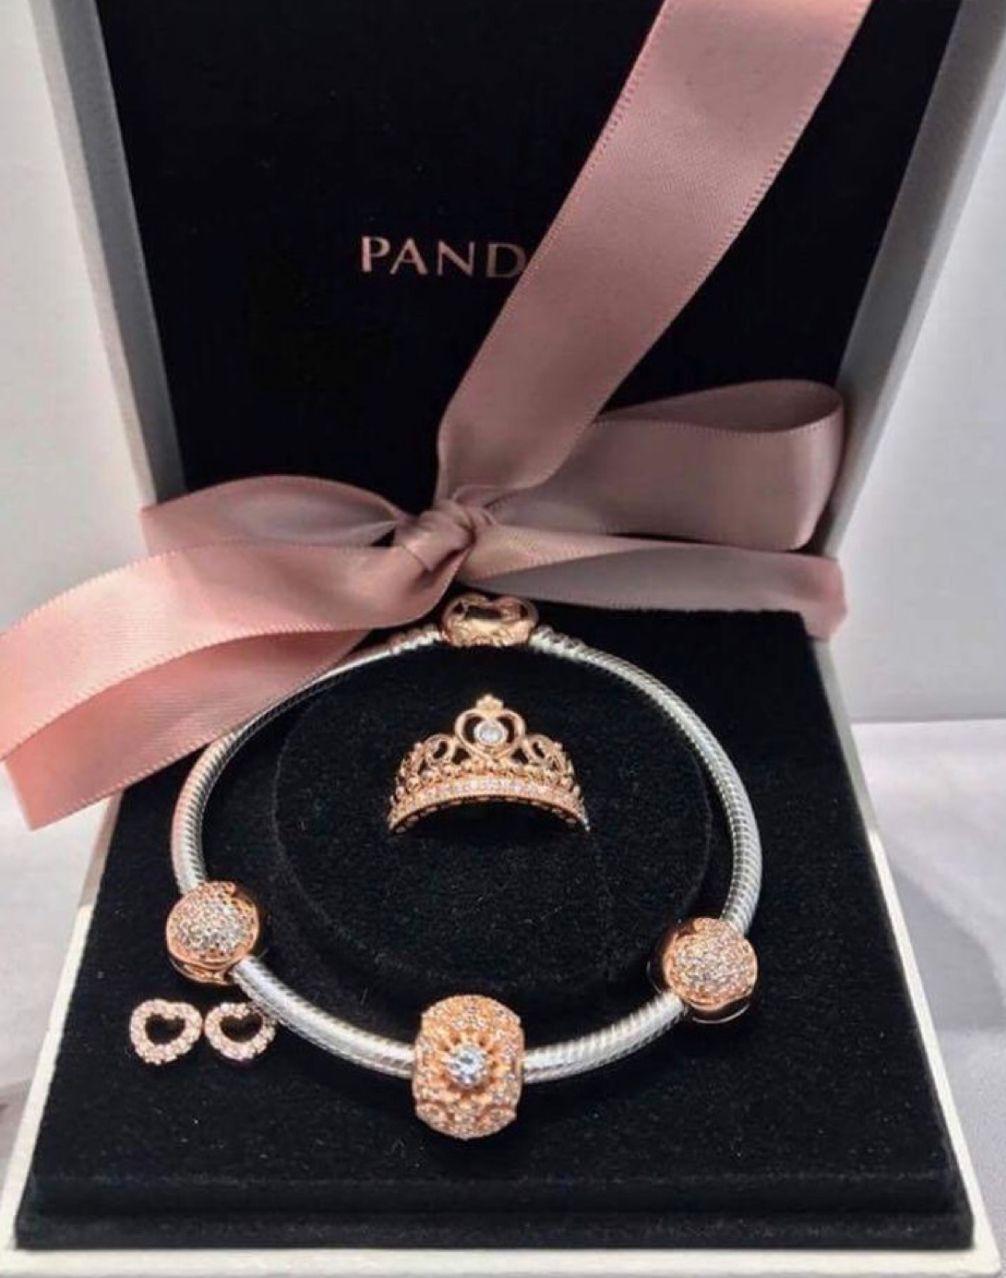 More Jnayetotneworld Cute Jewelry Pandora Jewelry Accessories